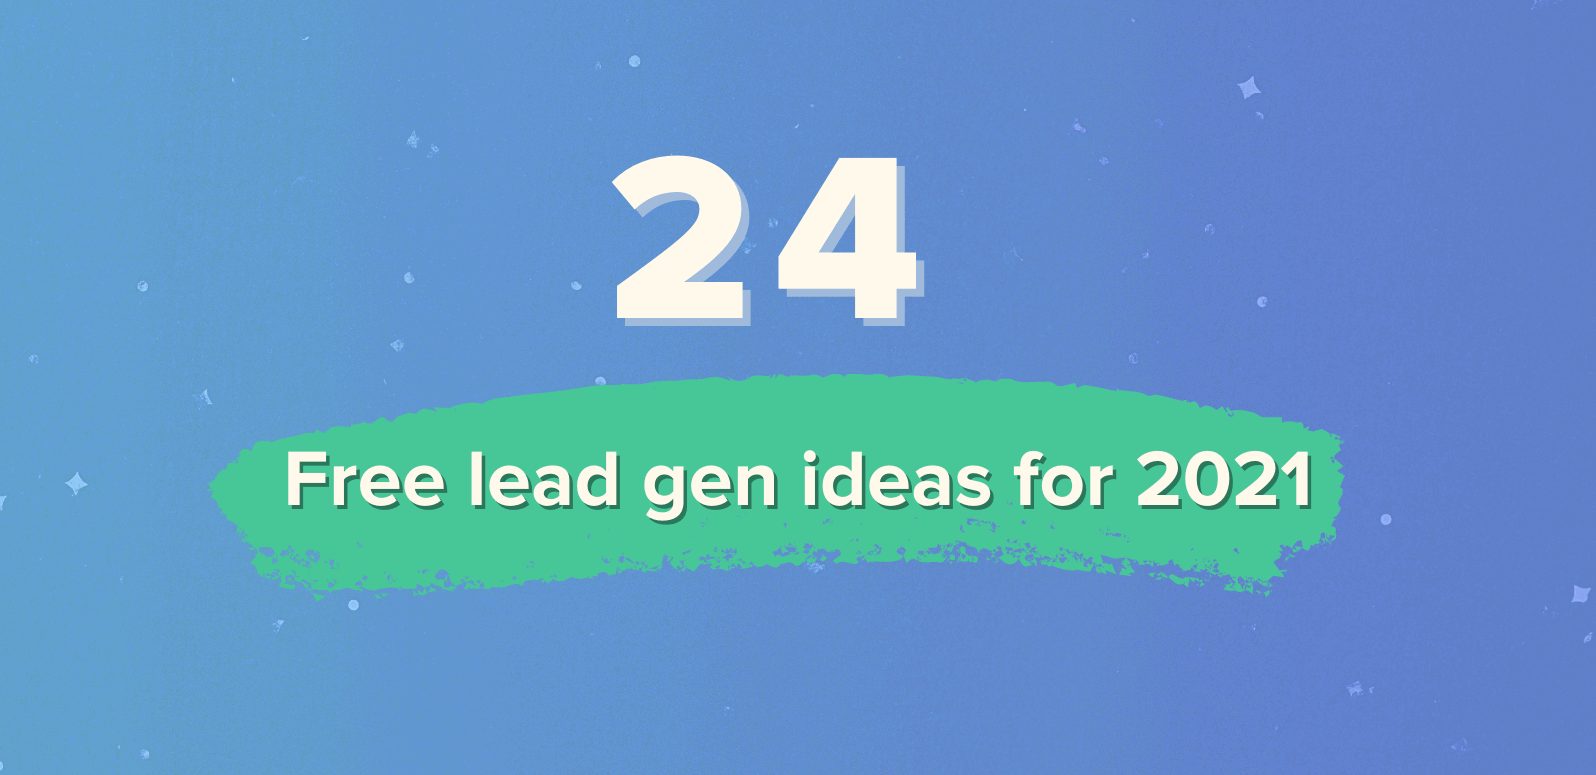 Real Estate Leads: 24 FREE Lead Gen Ideas for 2021